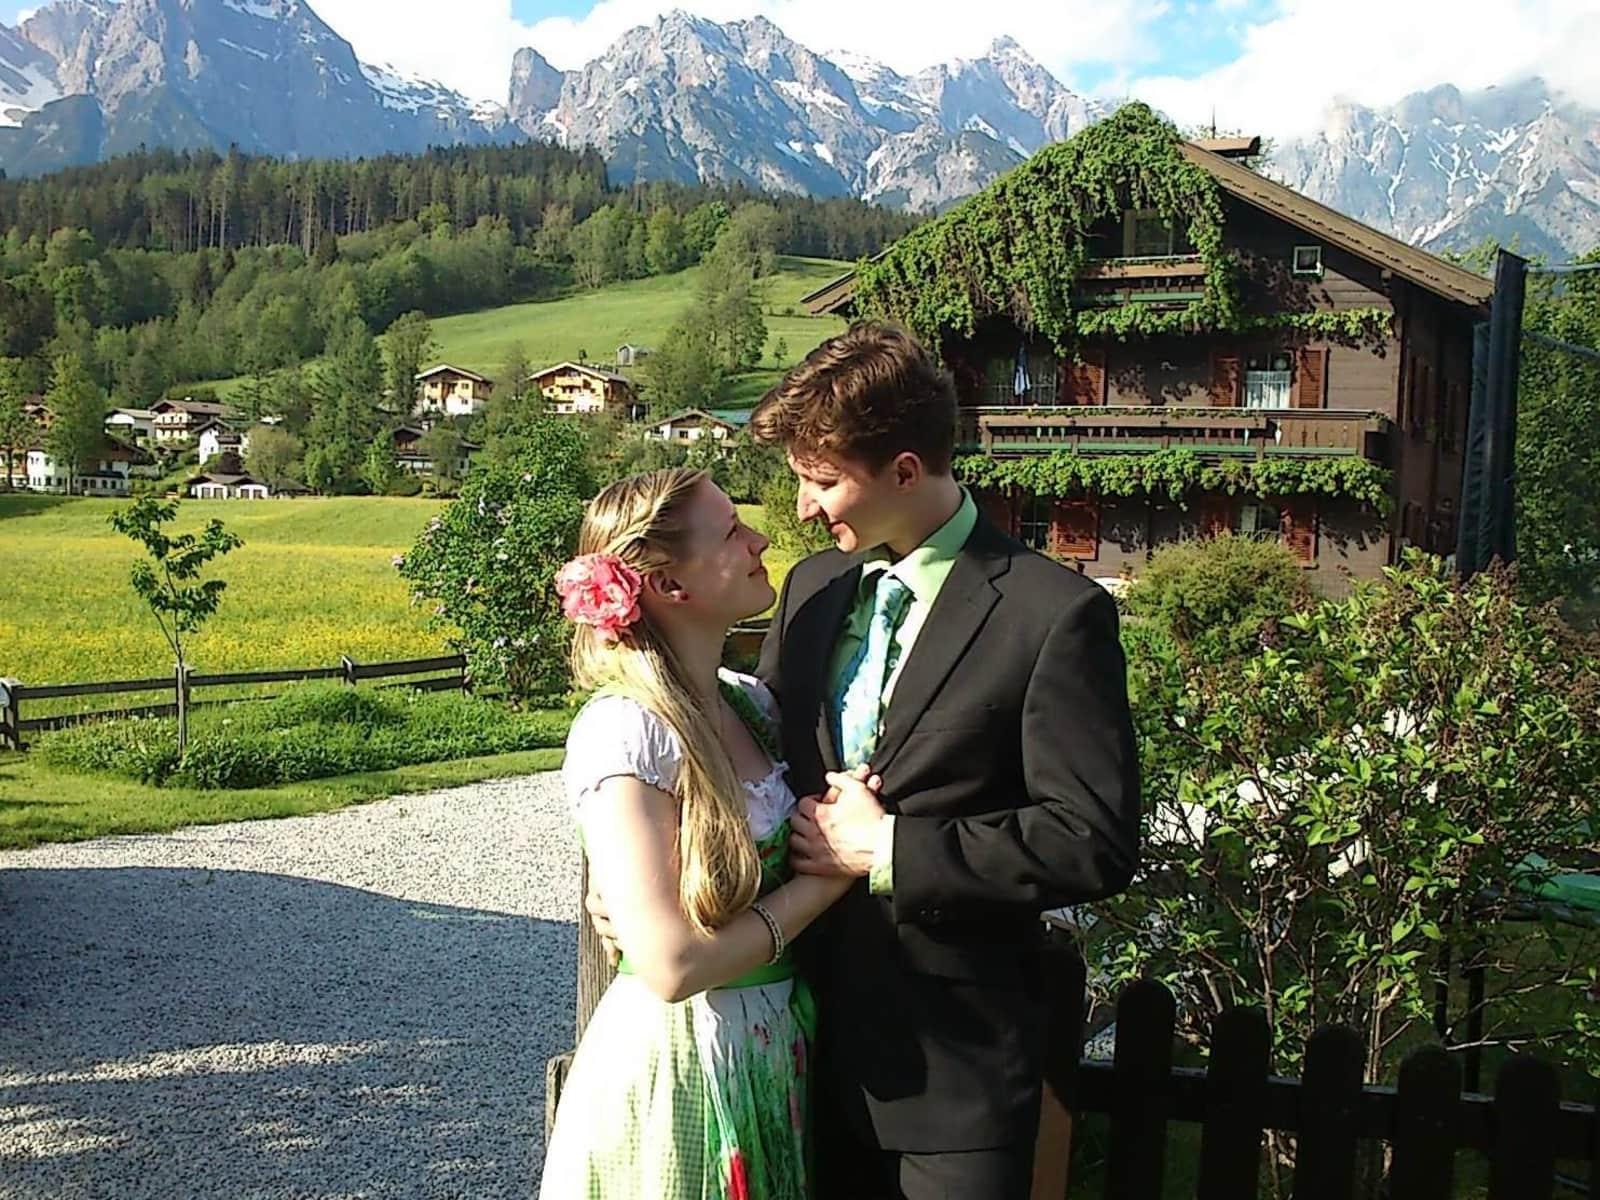 Barbara & Christoph from Vienna, Austria